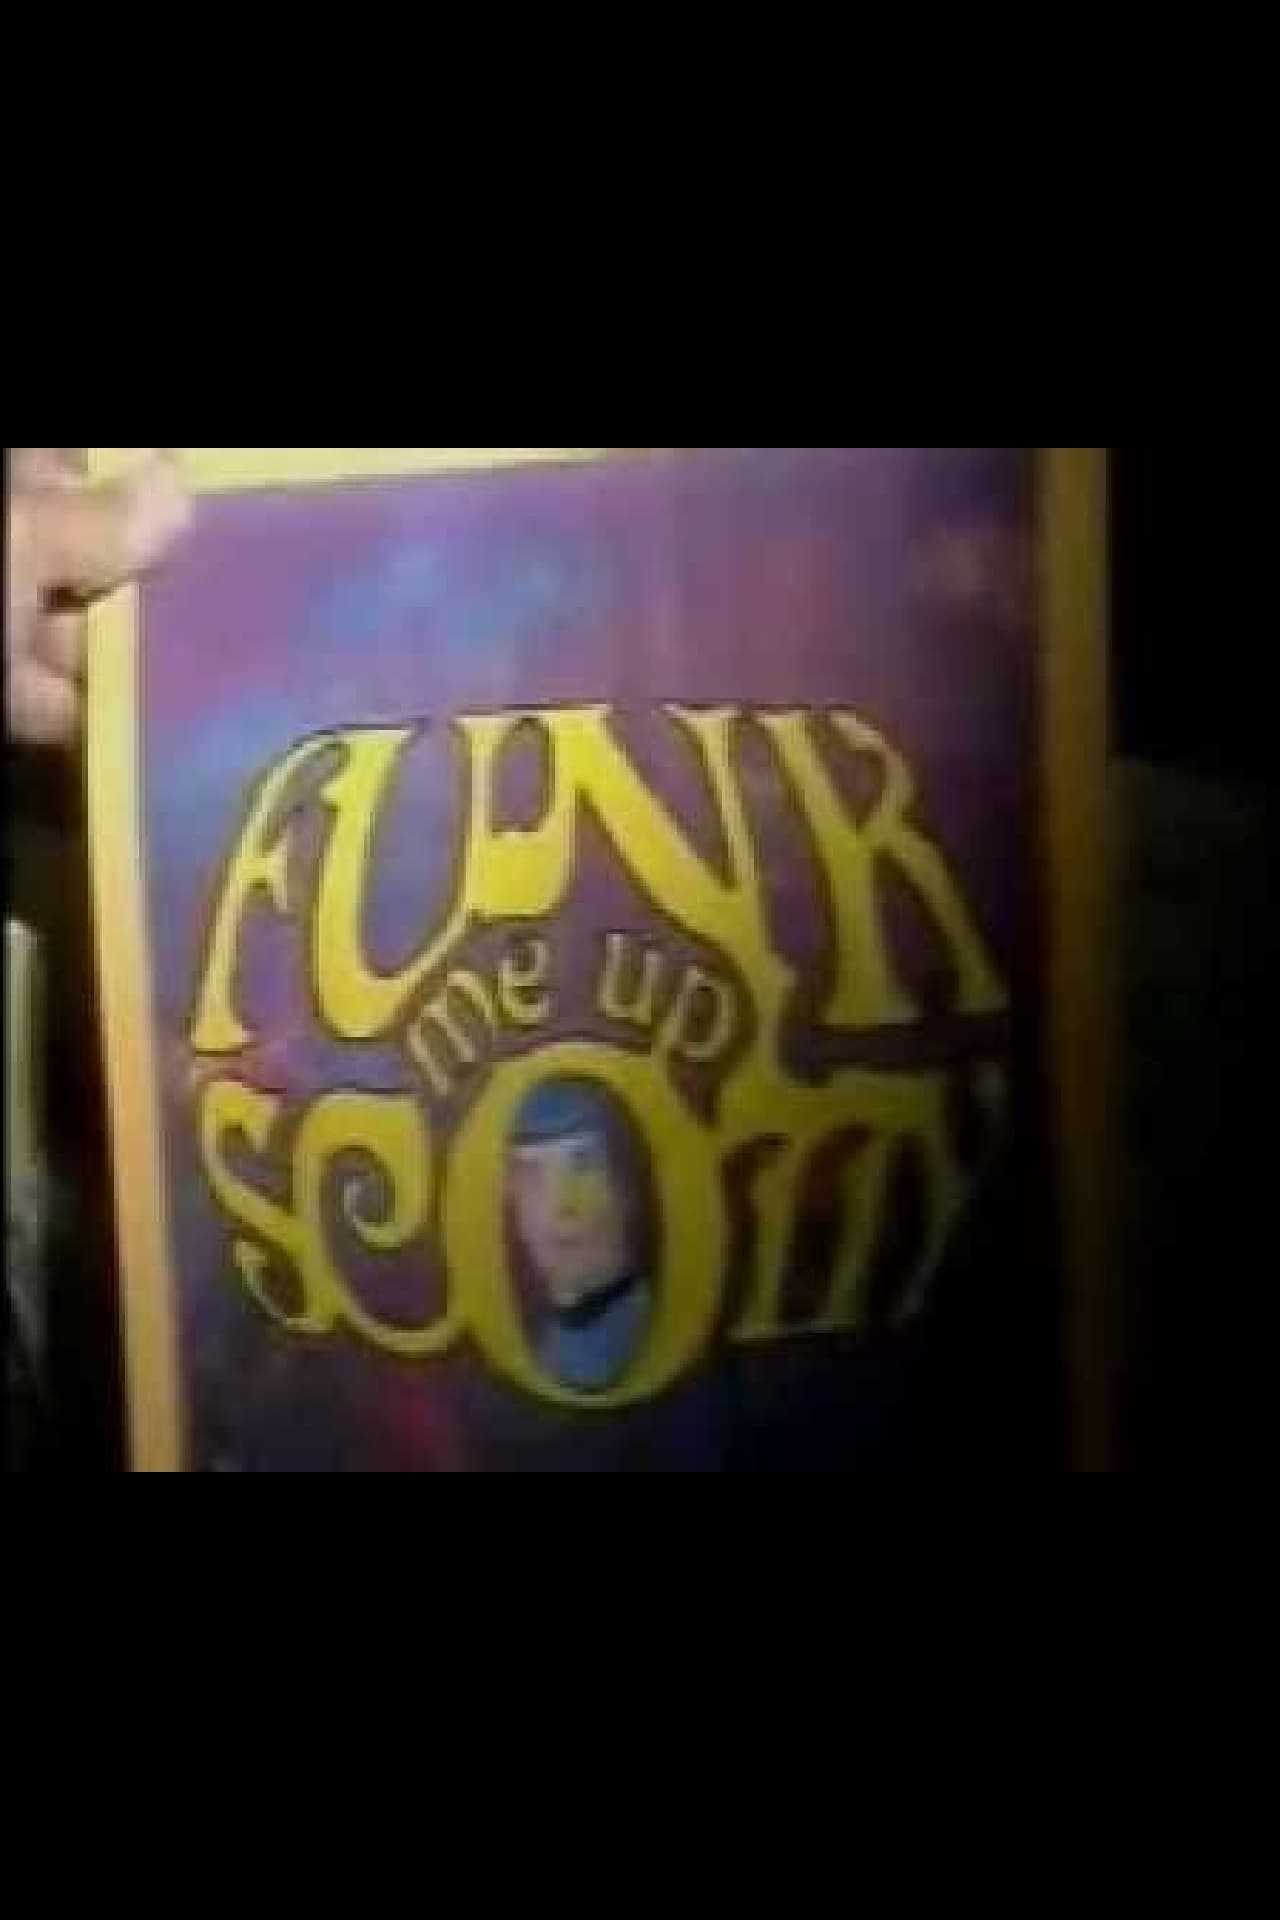 Funk Me Up, Scotty (1996)